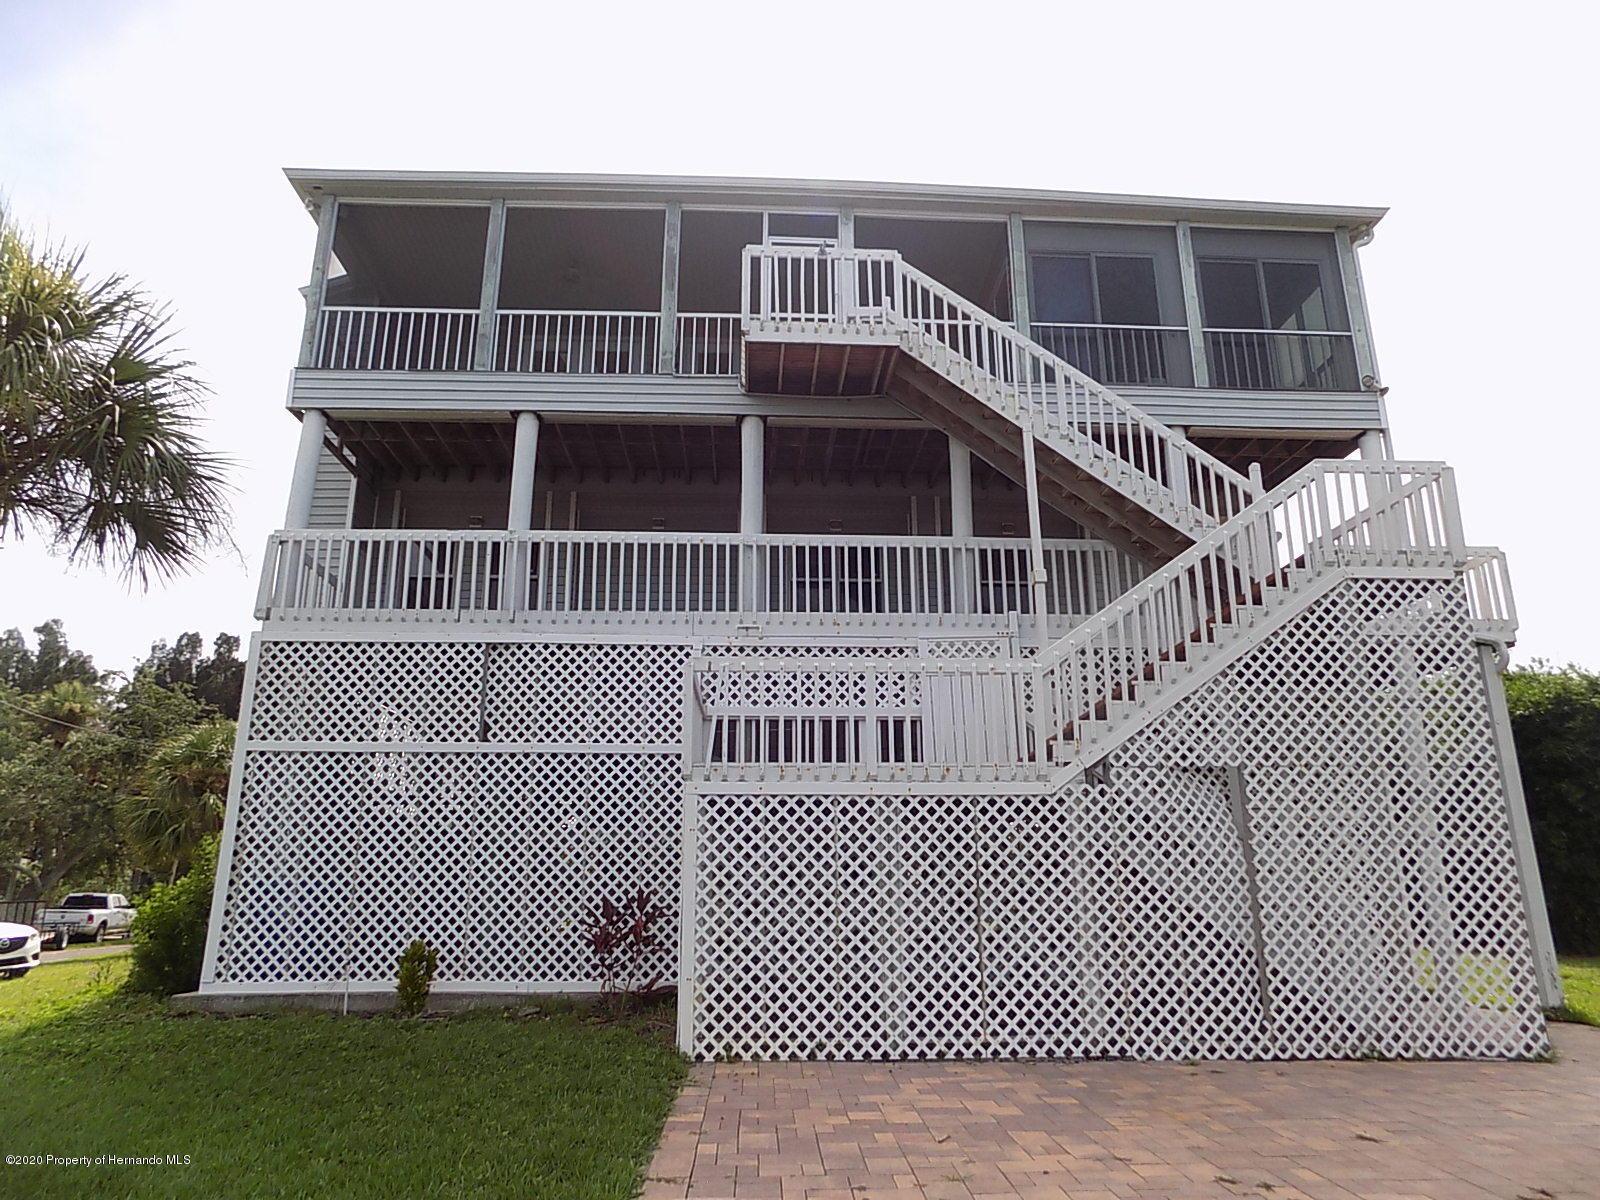 Details for 3470 Tidewater Drive, Weeki Wachee, FL 34607